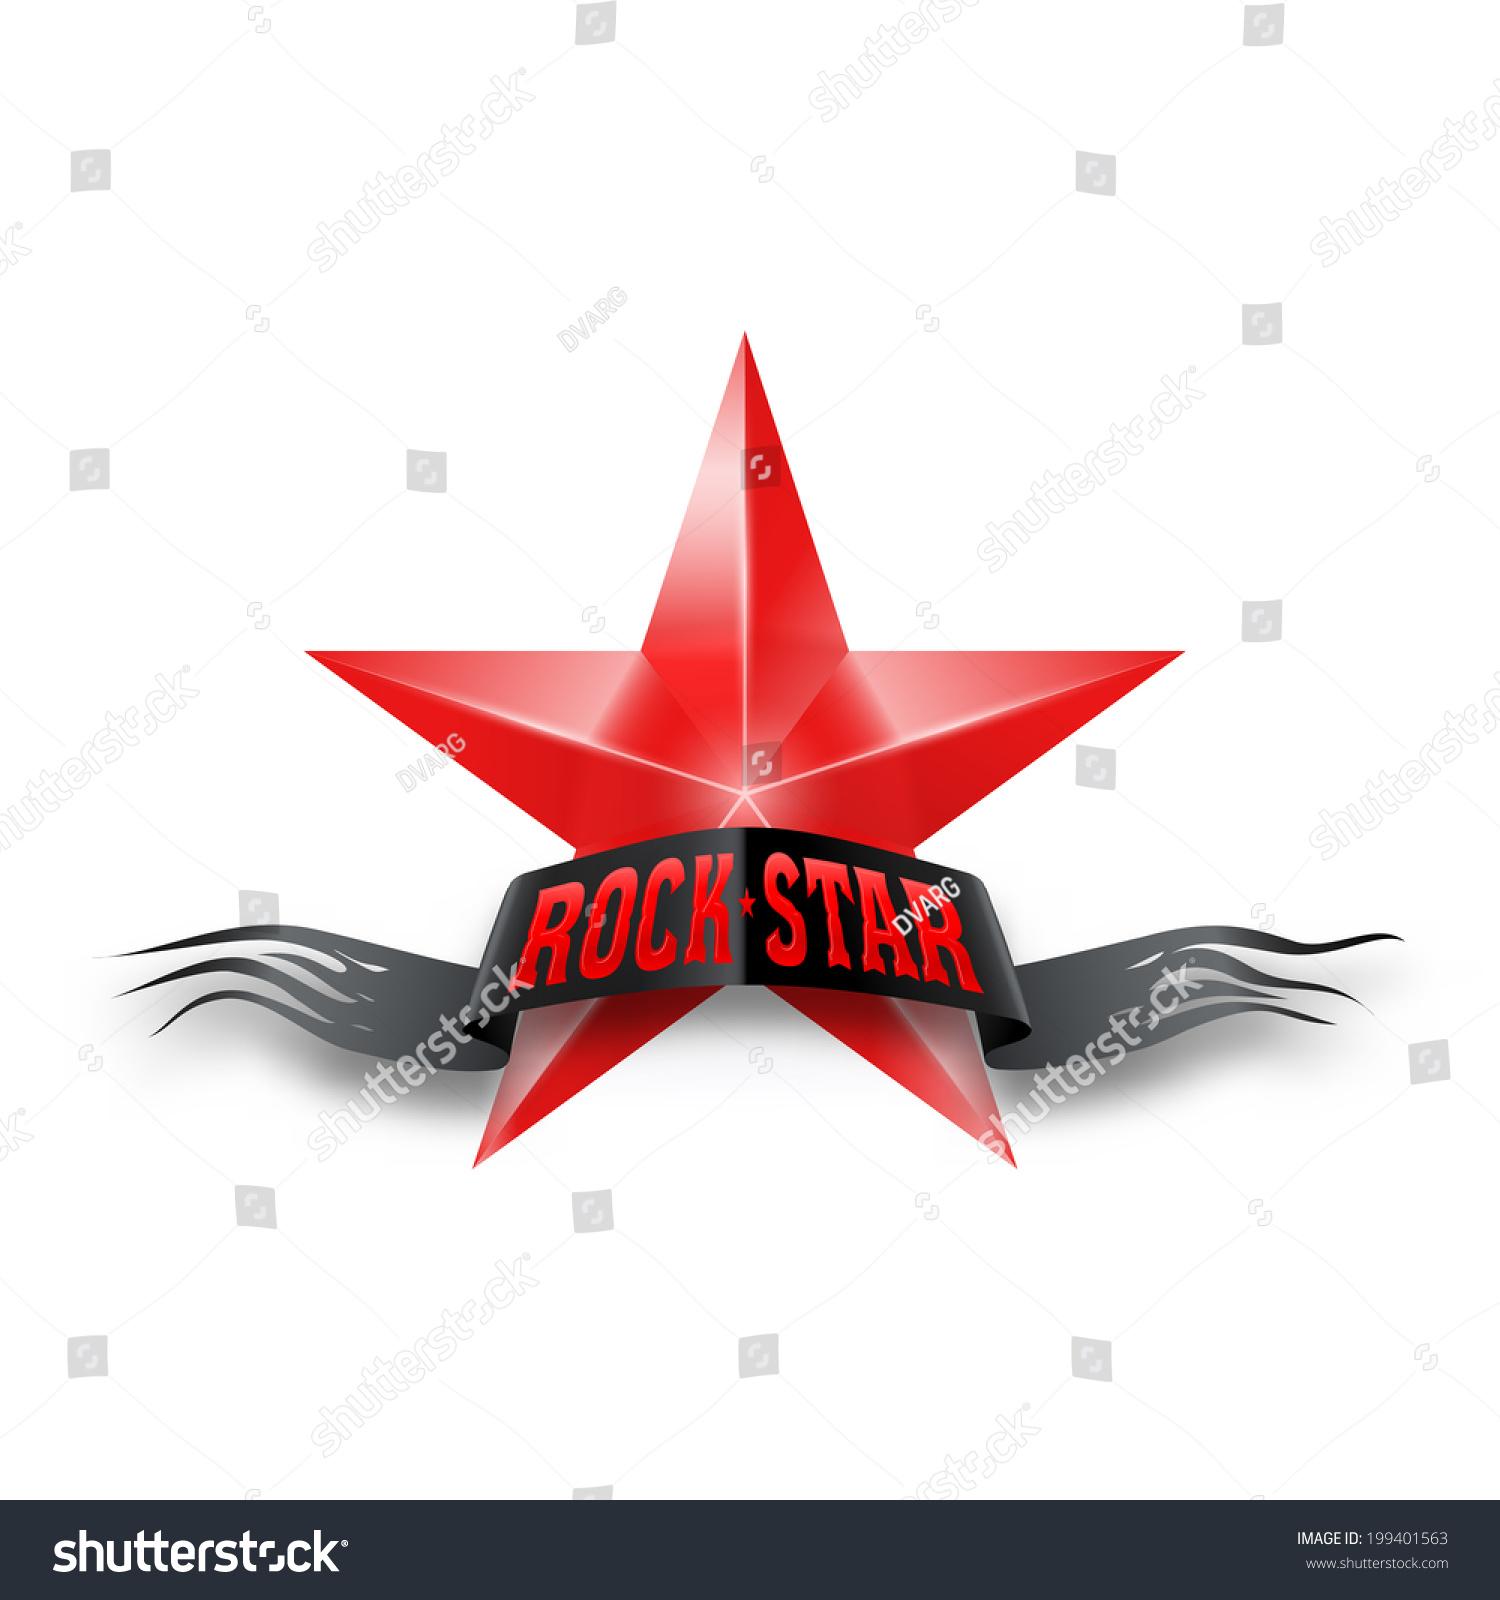 Red Star With Black Torn Rock Star Banner Illustration On White